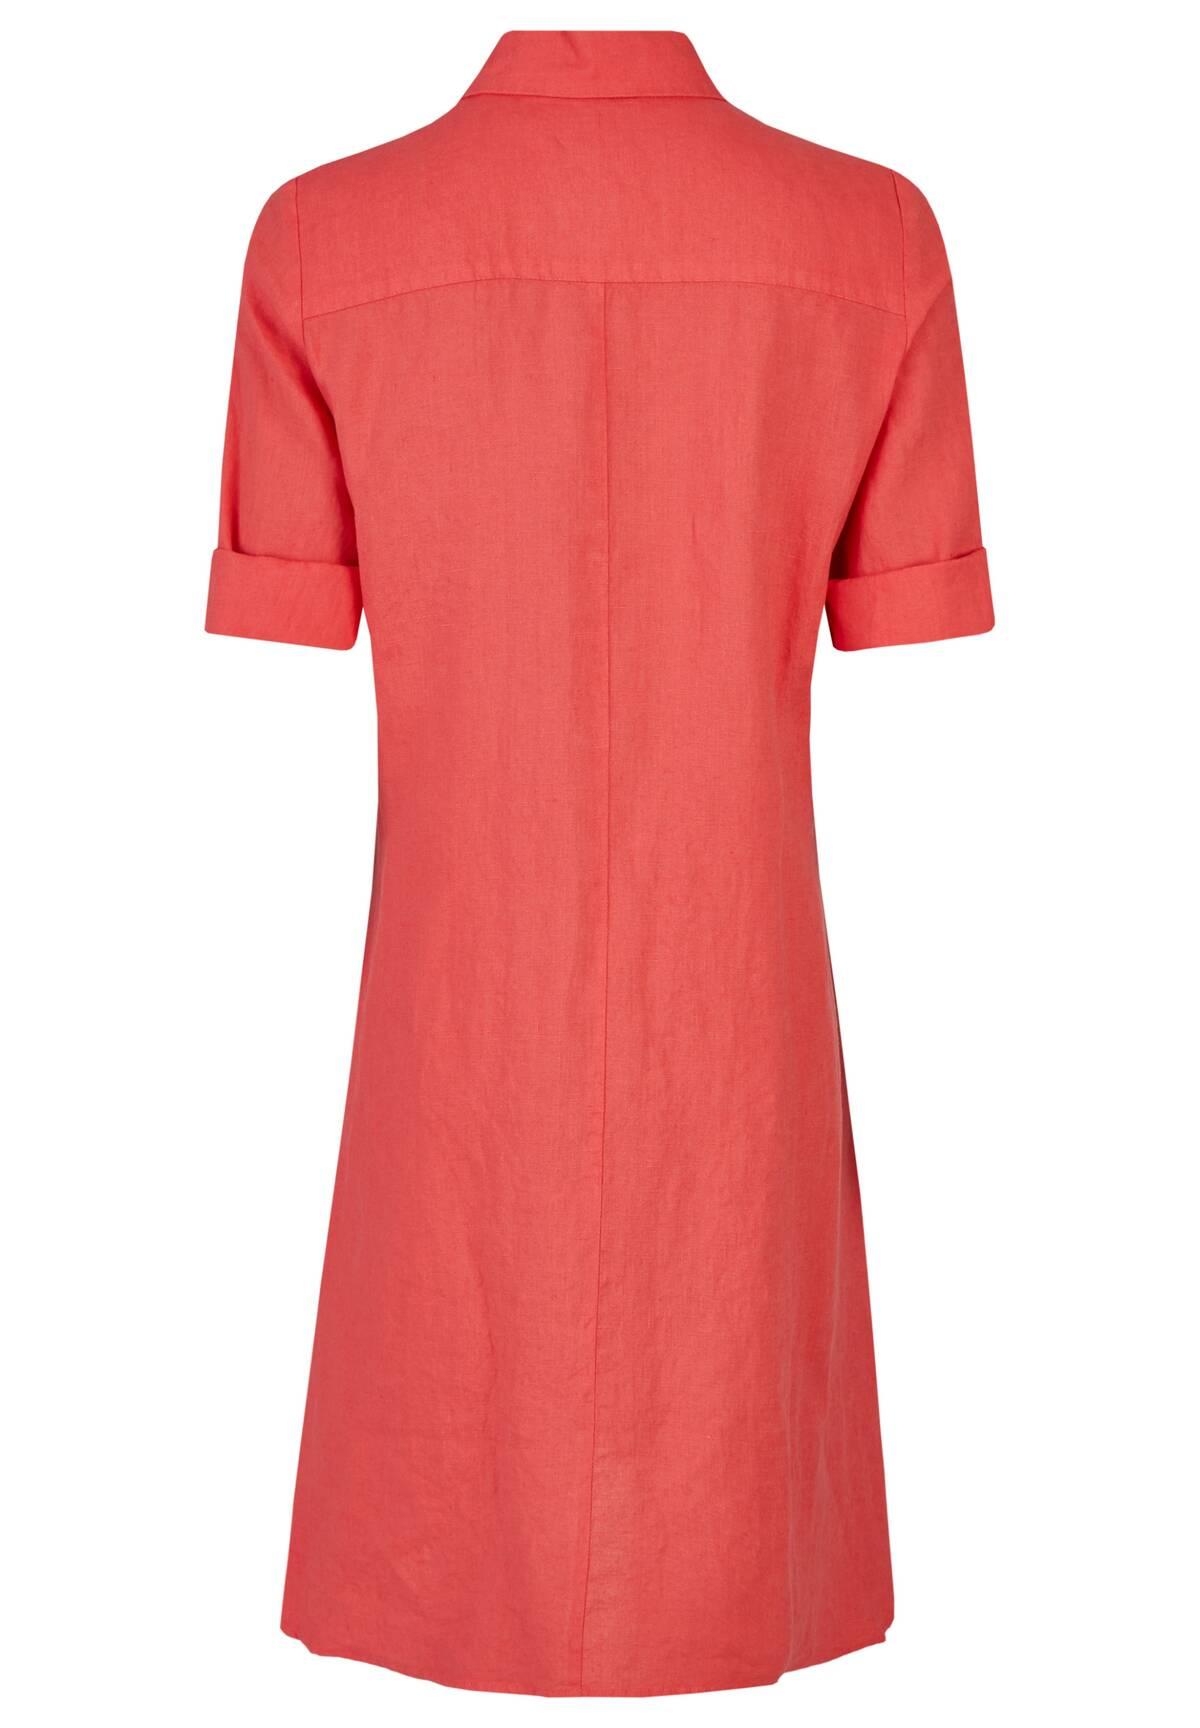 Modernes Blusenkleid / Dress